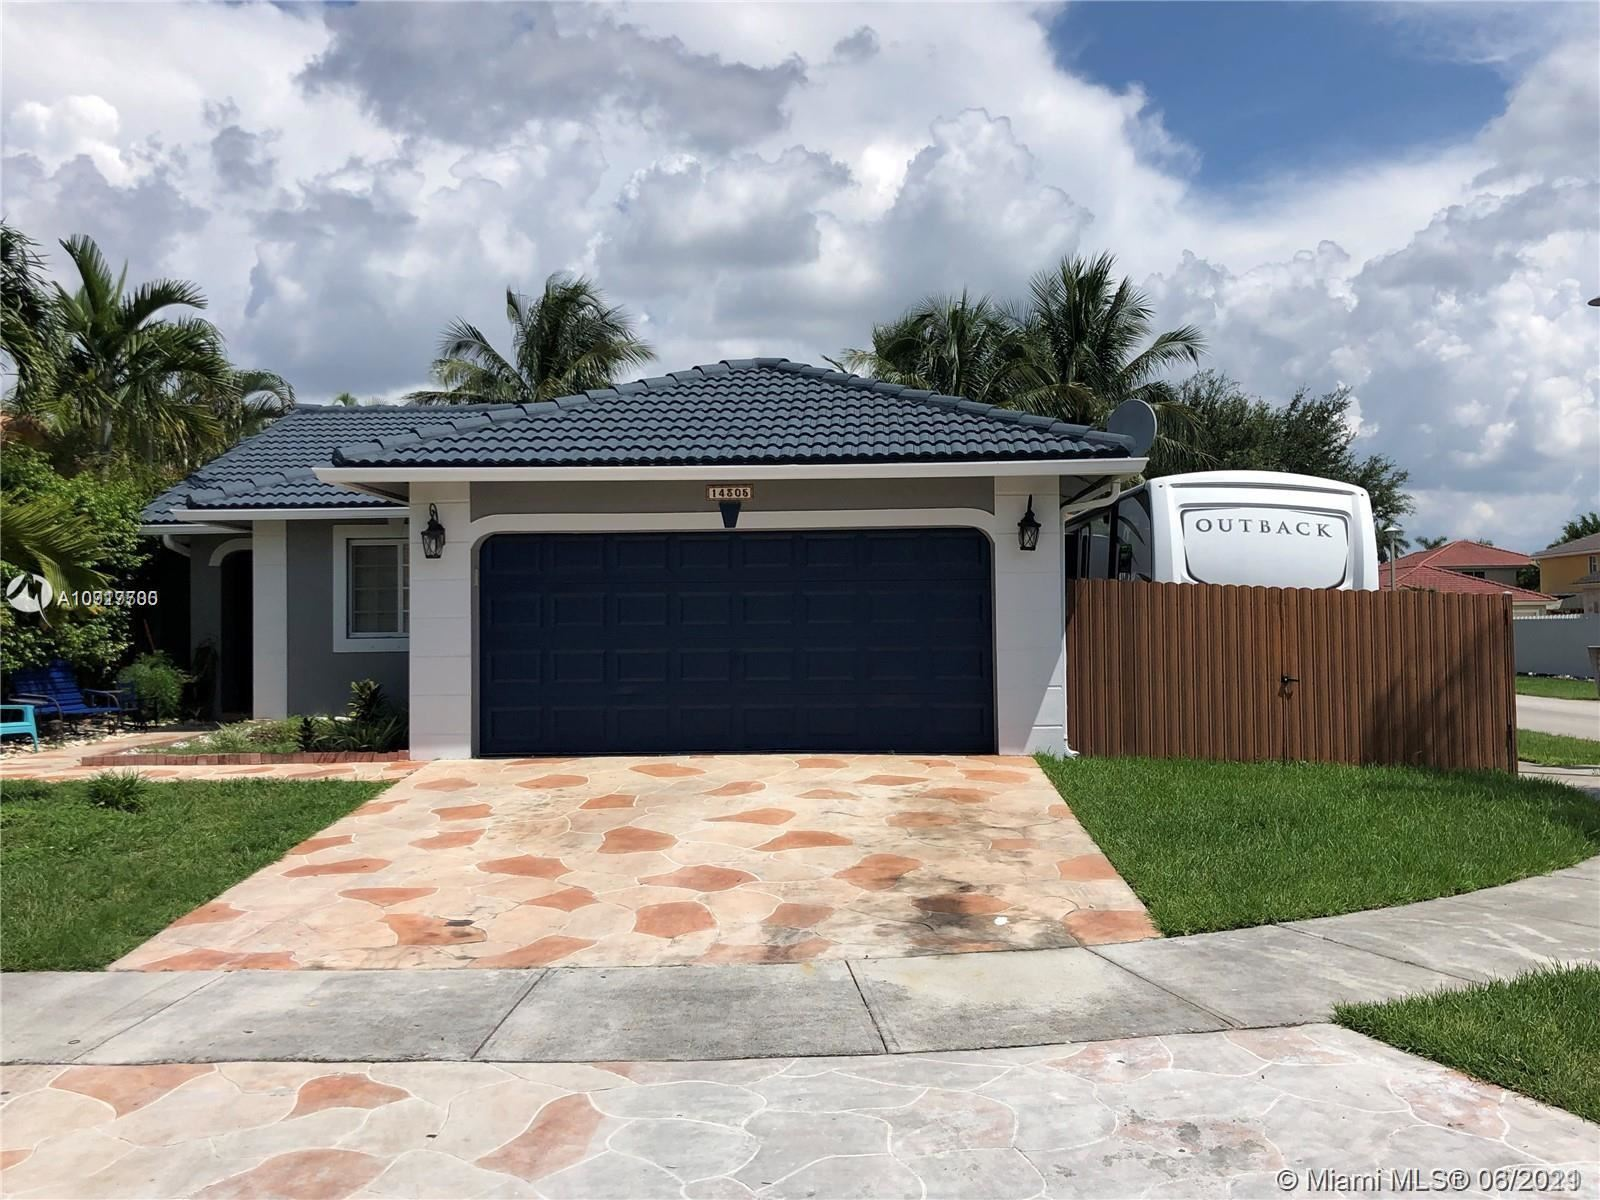 14305 SW 182nd Ter, Miami, FL 33177 - #: A10917700